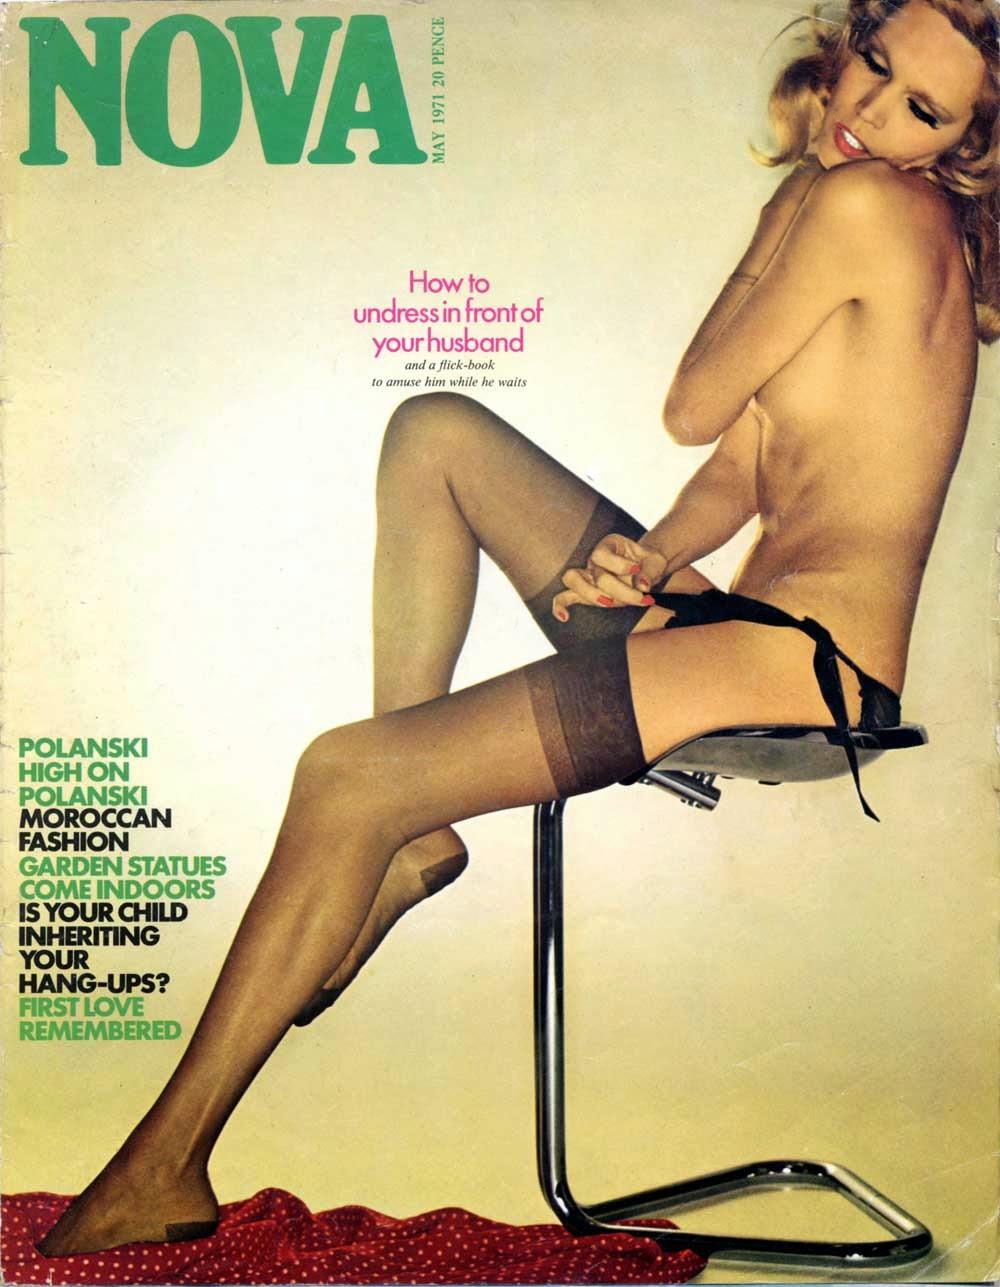 Hustler magazine january 1985 hot ticket photography